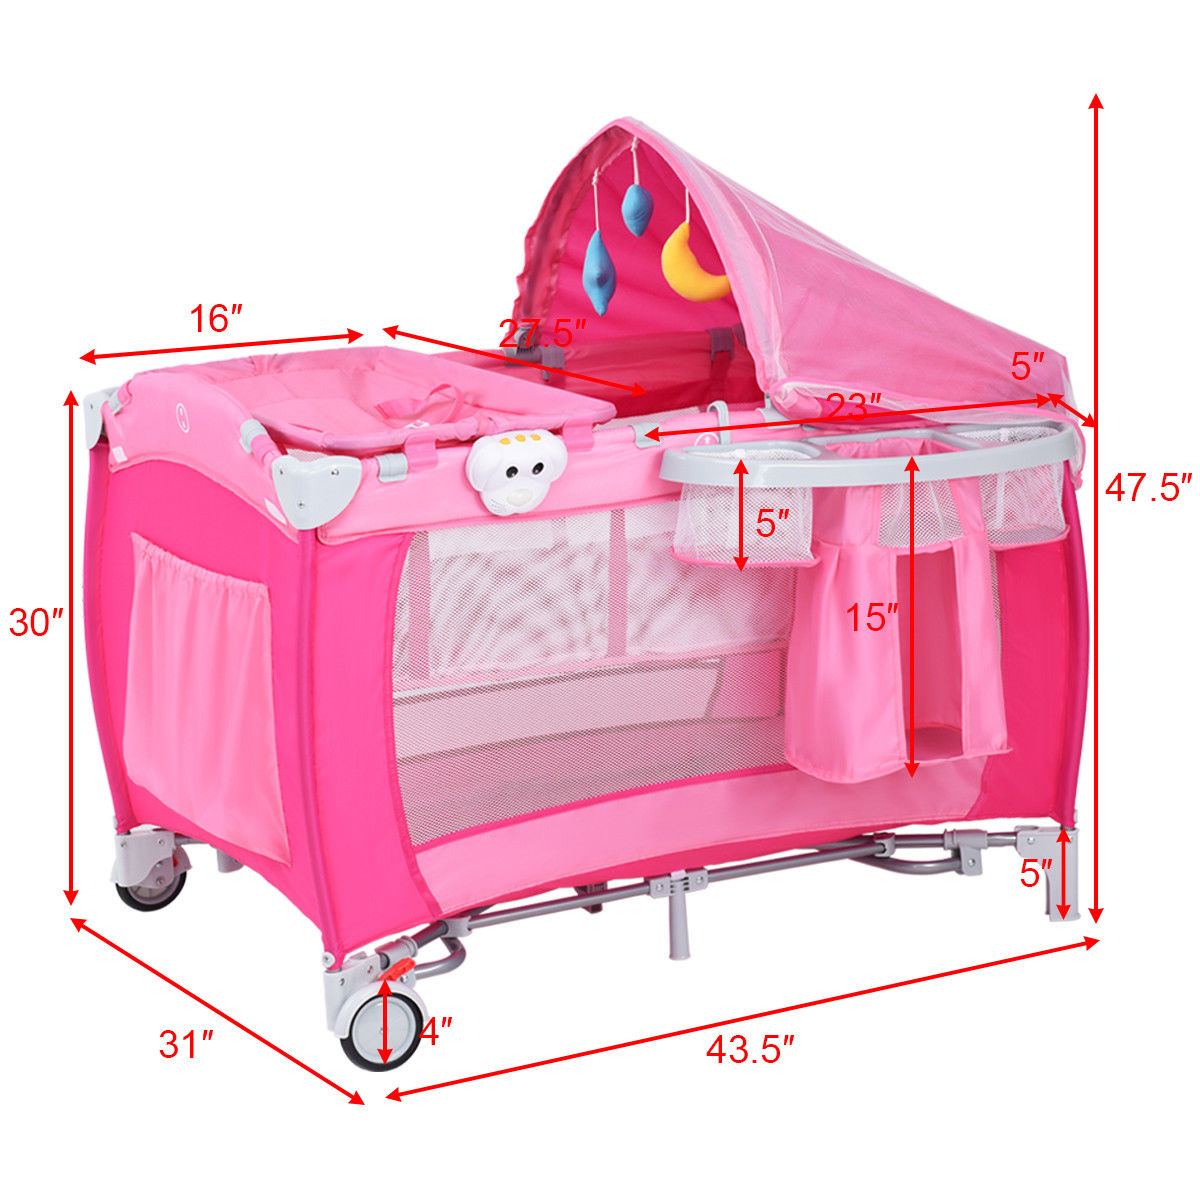 Costway Foldable Baby Crib Playpen Travel Infant Bassinet Bed Mosquito Net Music W Bag Walmart Com Walmart Com